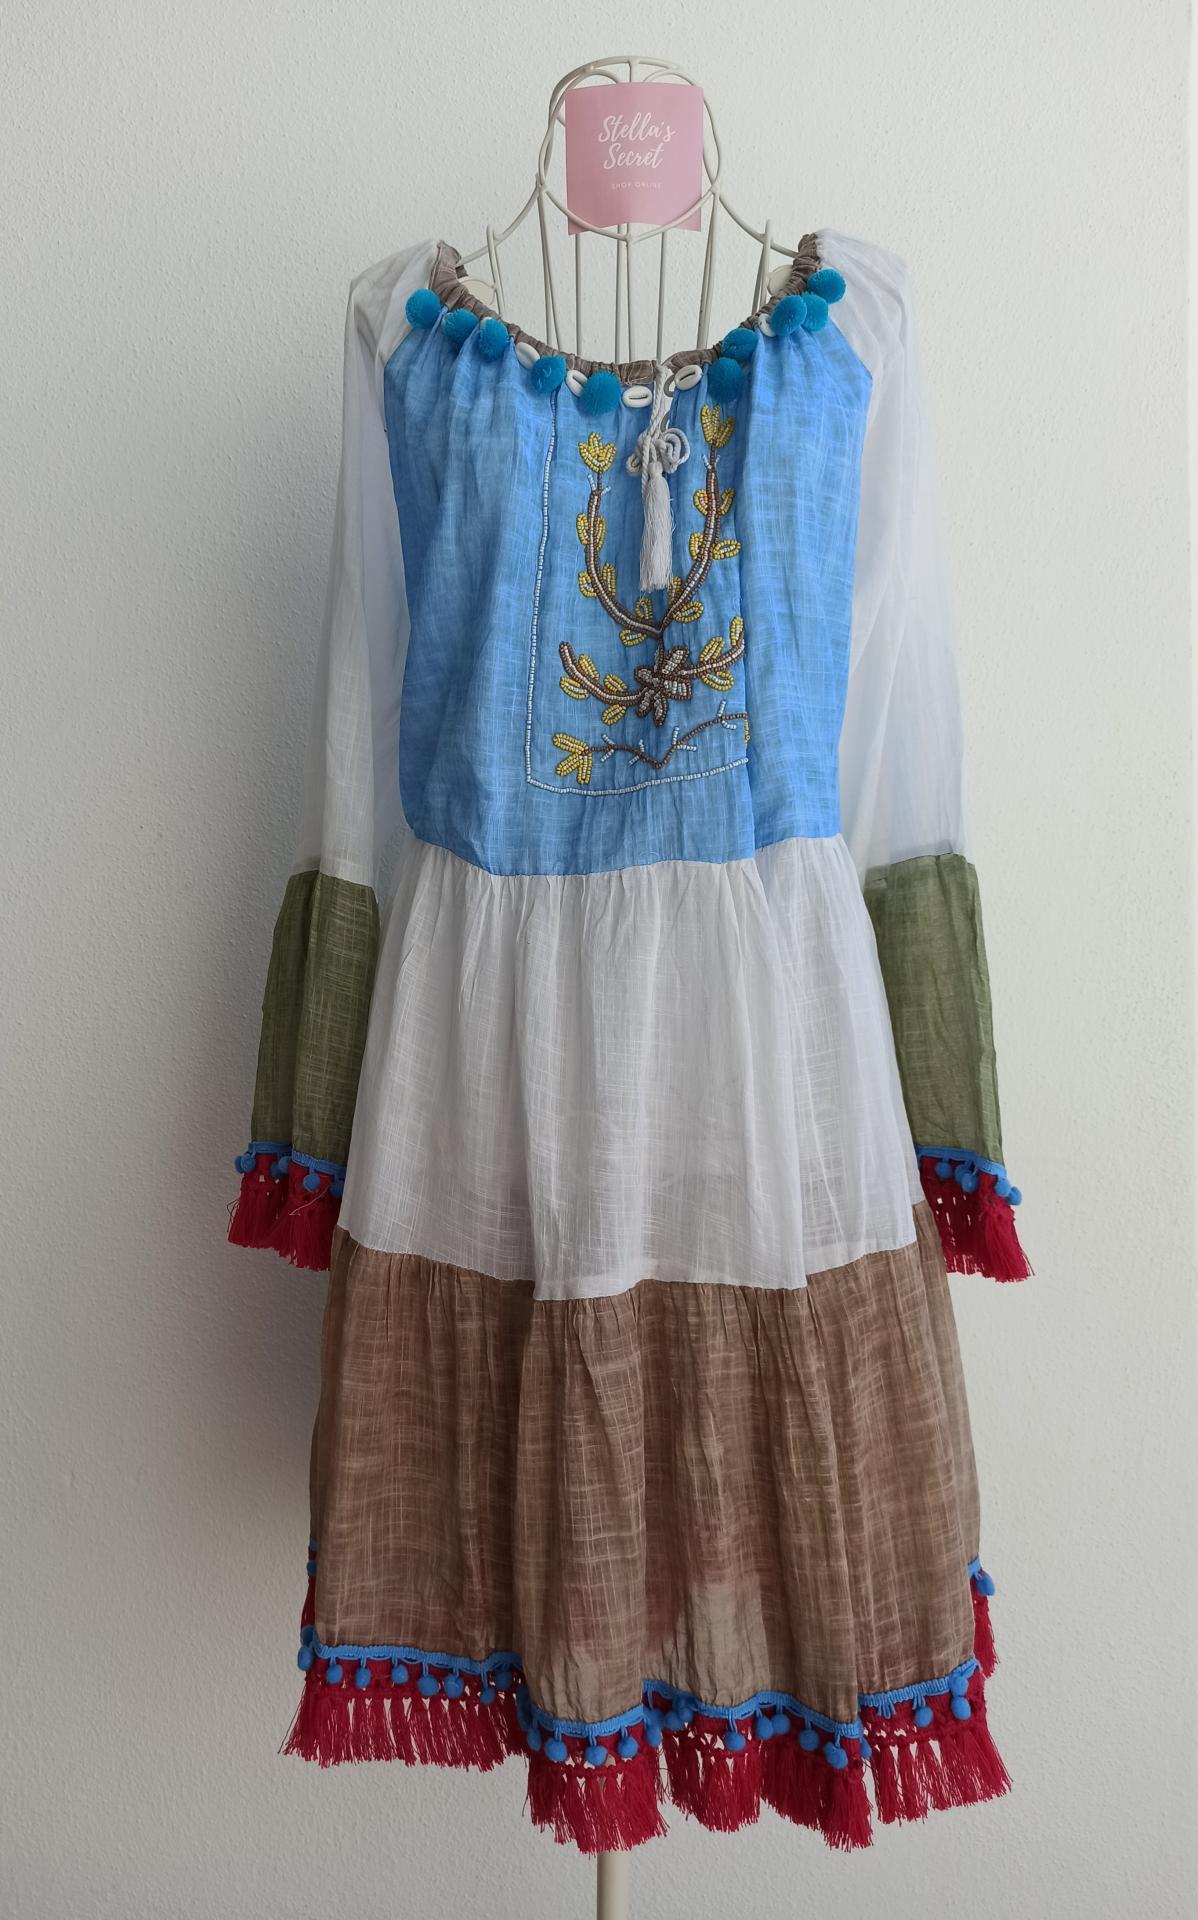 Vestido Boho Manga Larga en Azul y Beige